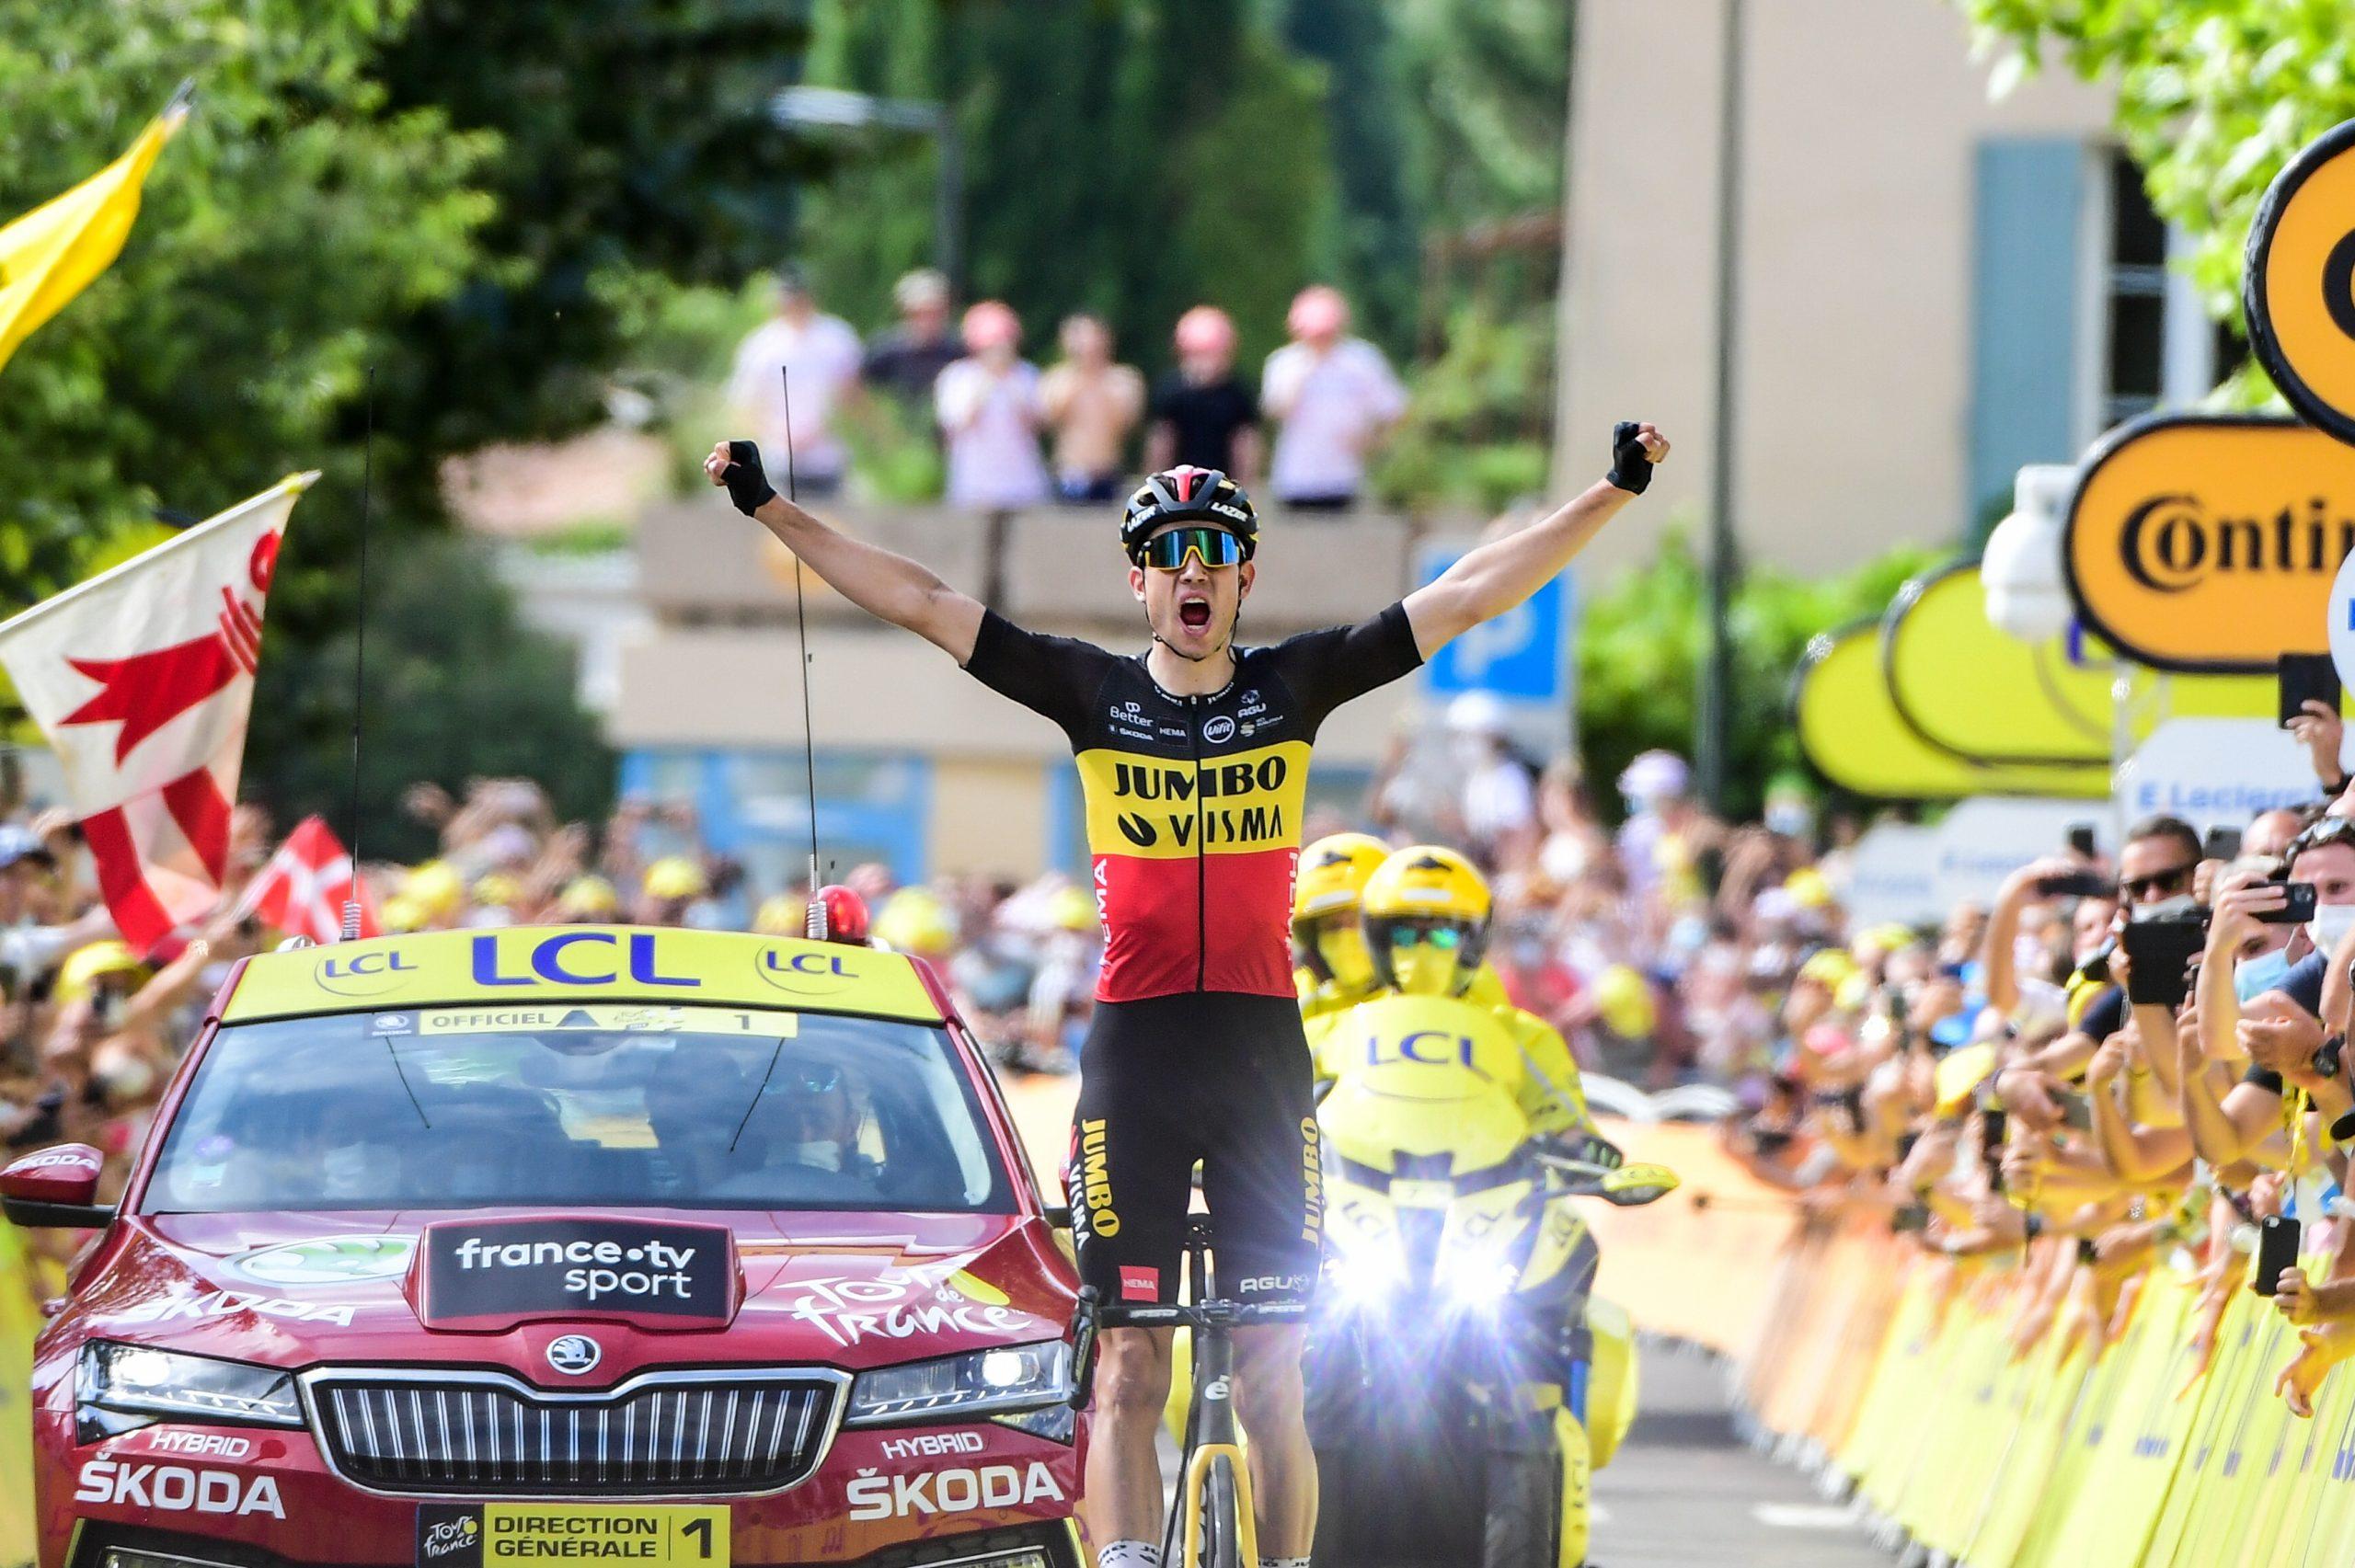 TdF 2021: Wout Van Aert vince la tappa del doppio Ventoux